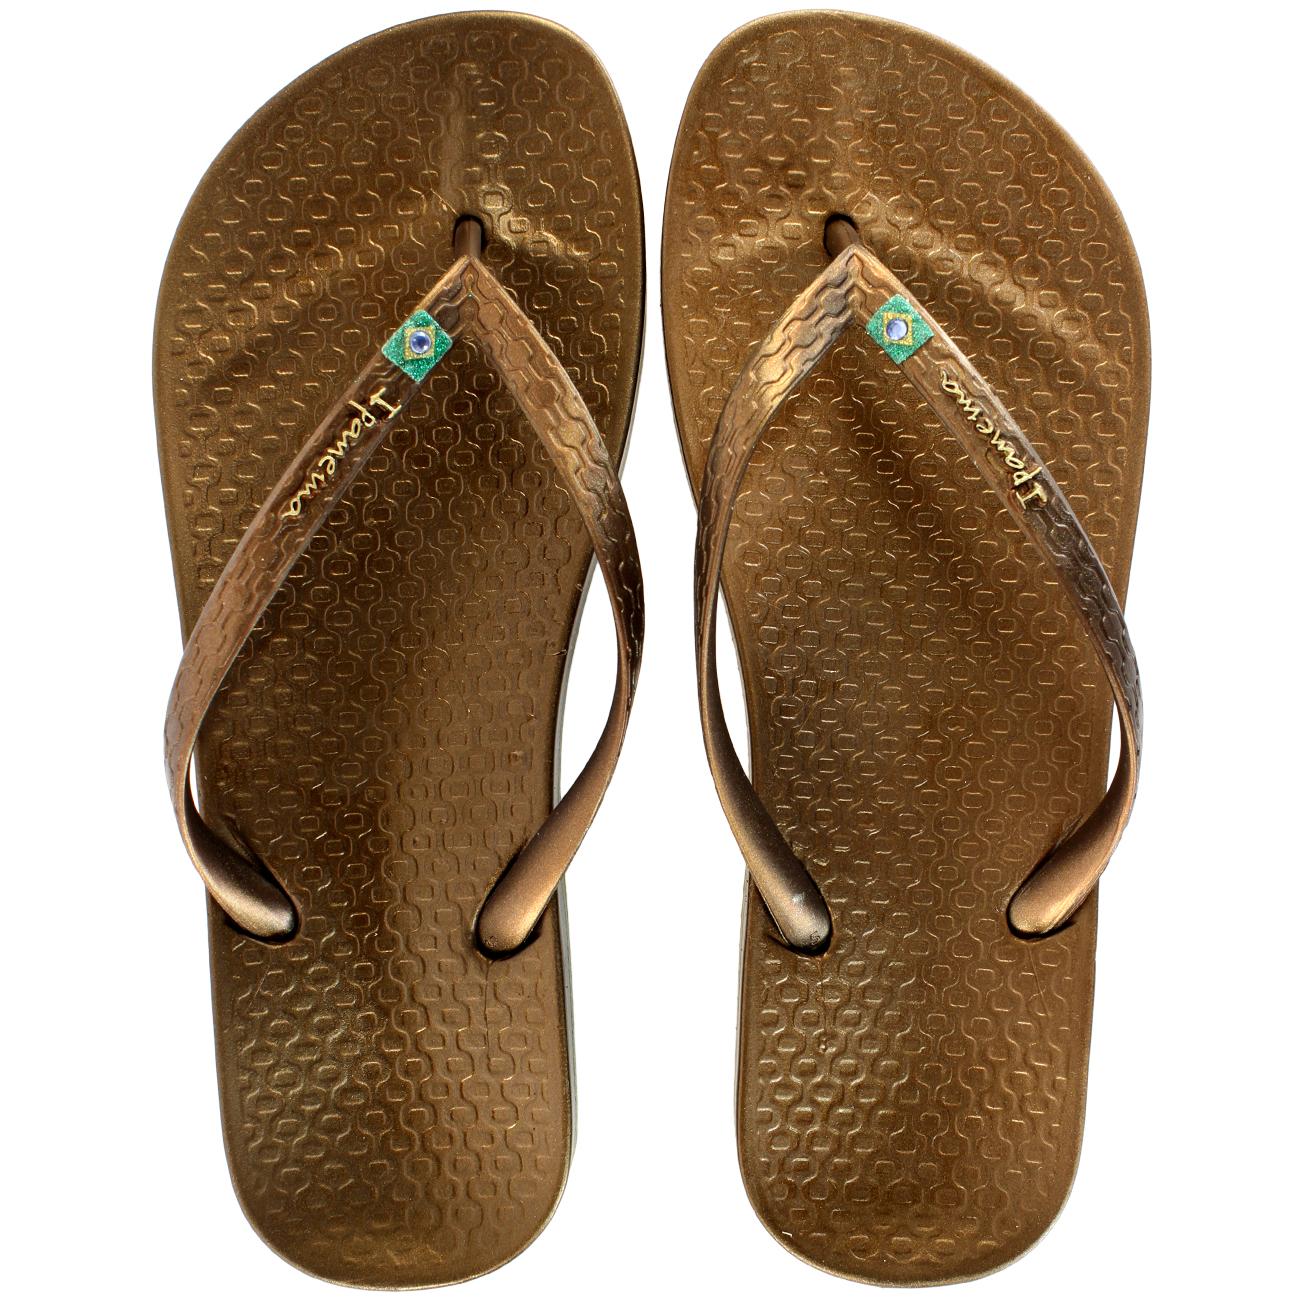 damen schuhe ipanema beach flip flops sandale designer flipflops eu sizes 36 41 ebay. Black Bedroom Furniture Sets. Home Design Ideas